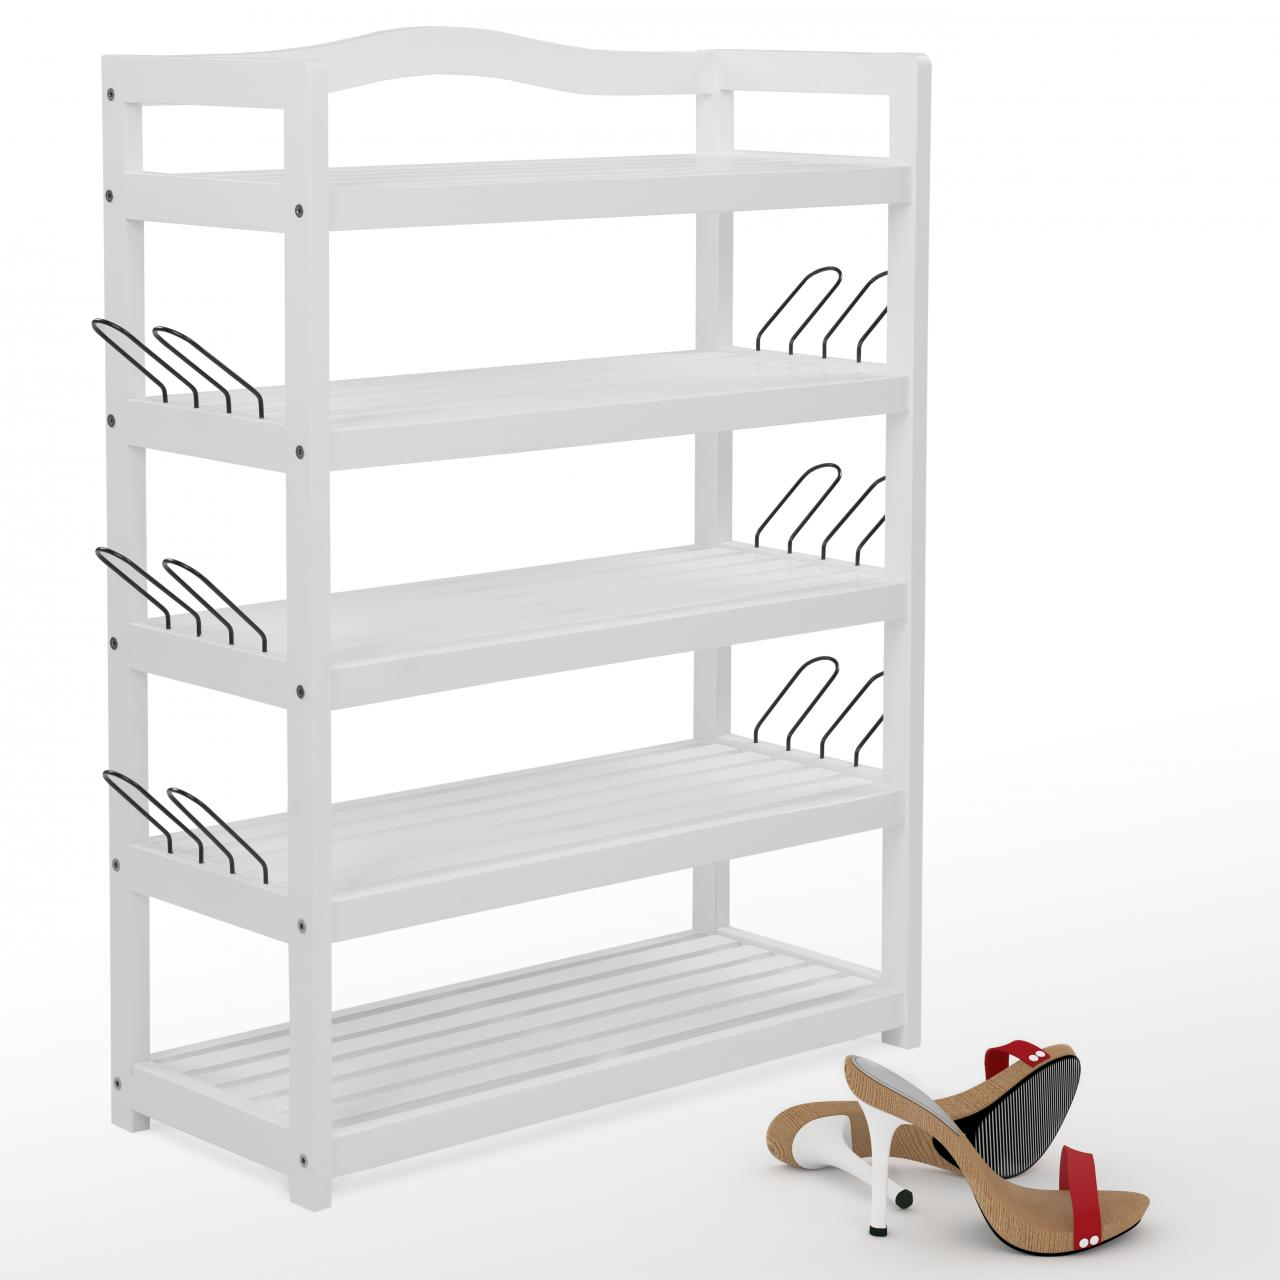 Shoe Rack 5 Tier Shoe Organiser Shoe Storage Stand Shoe